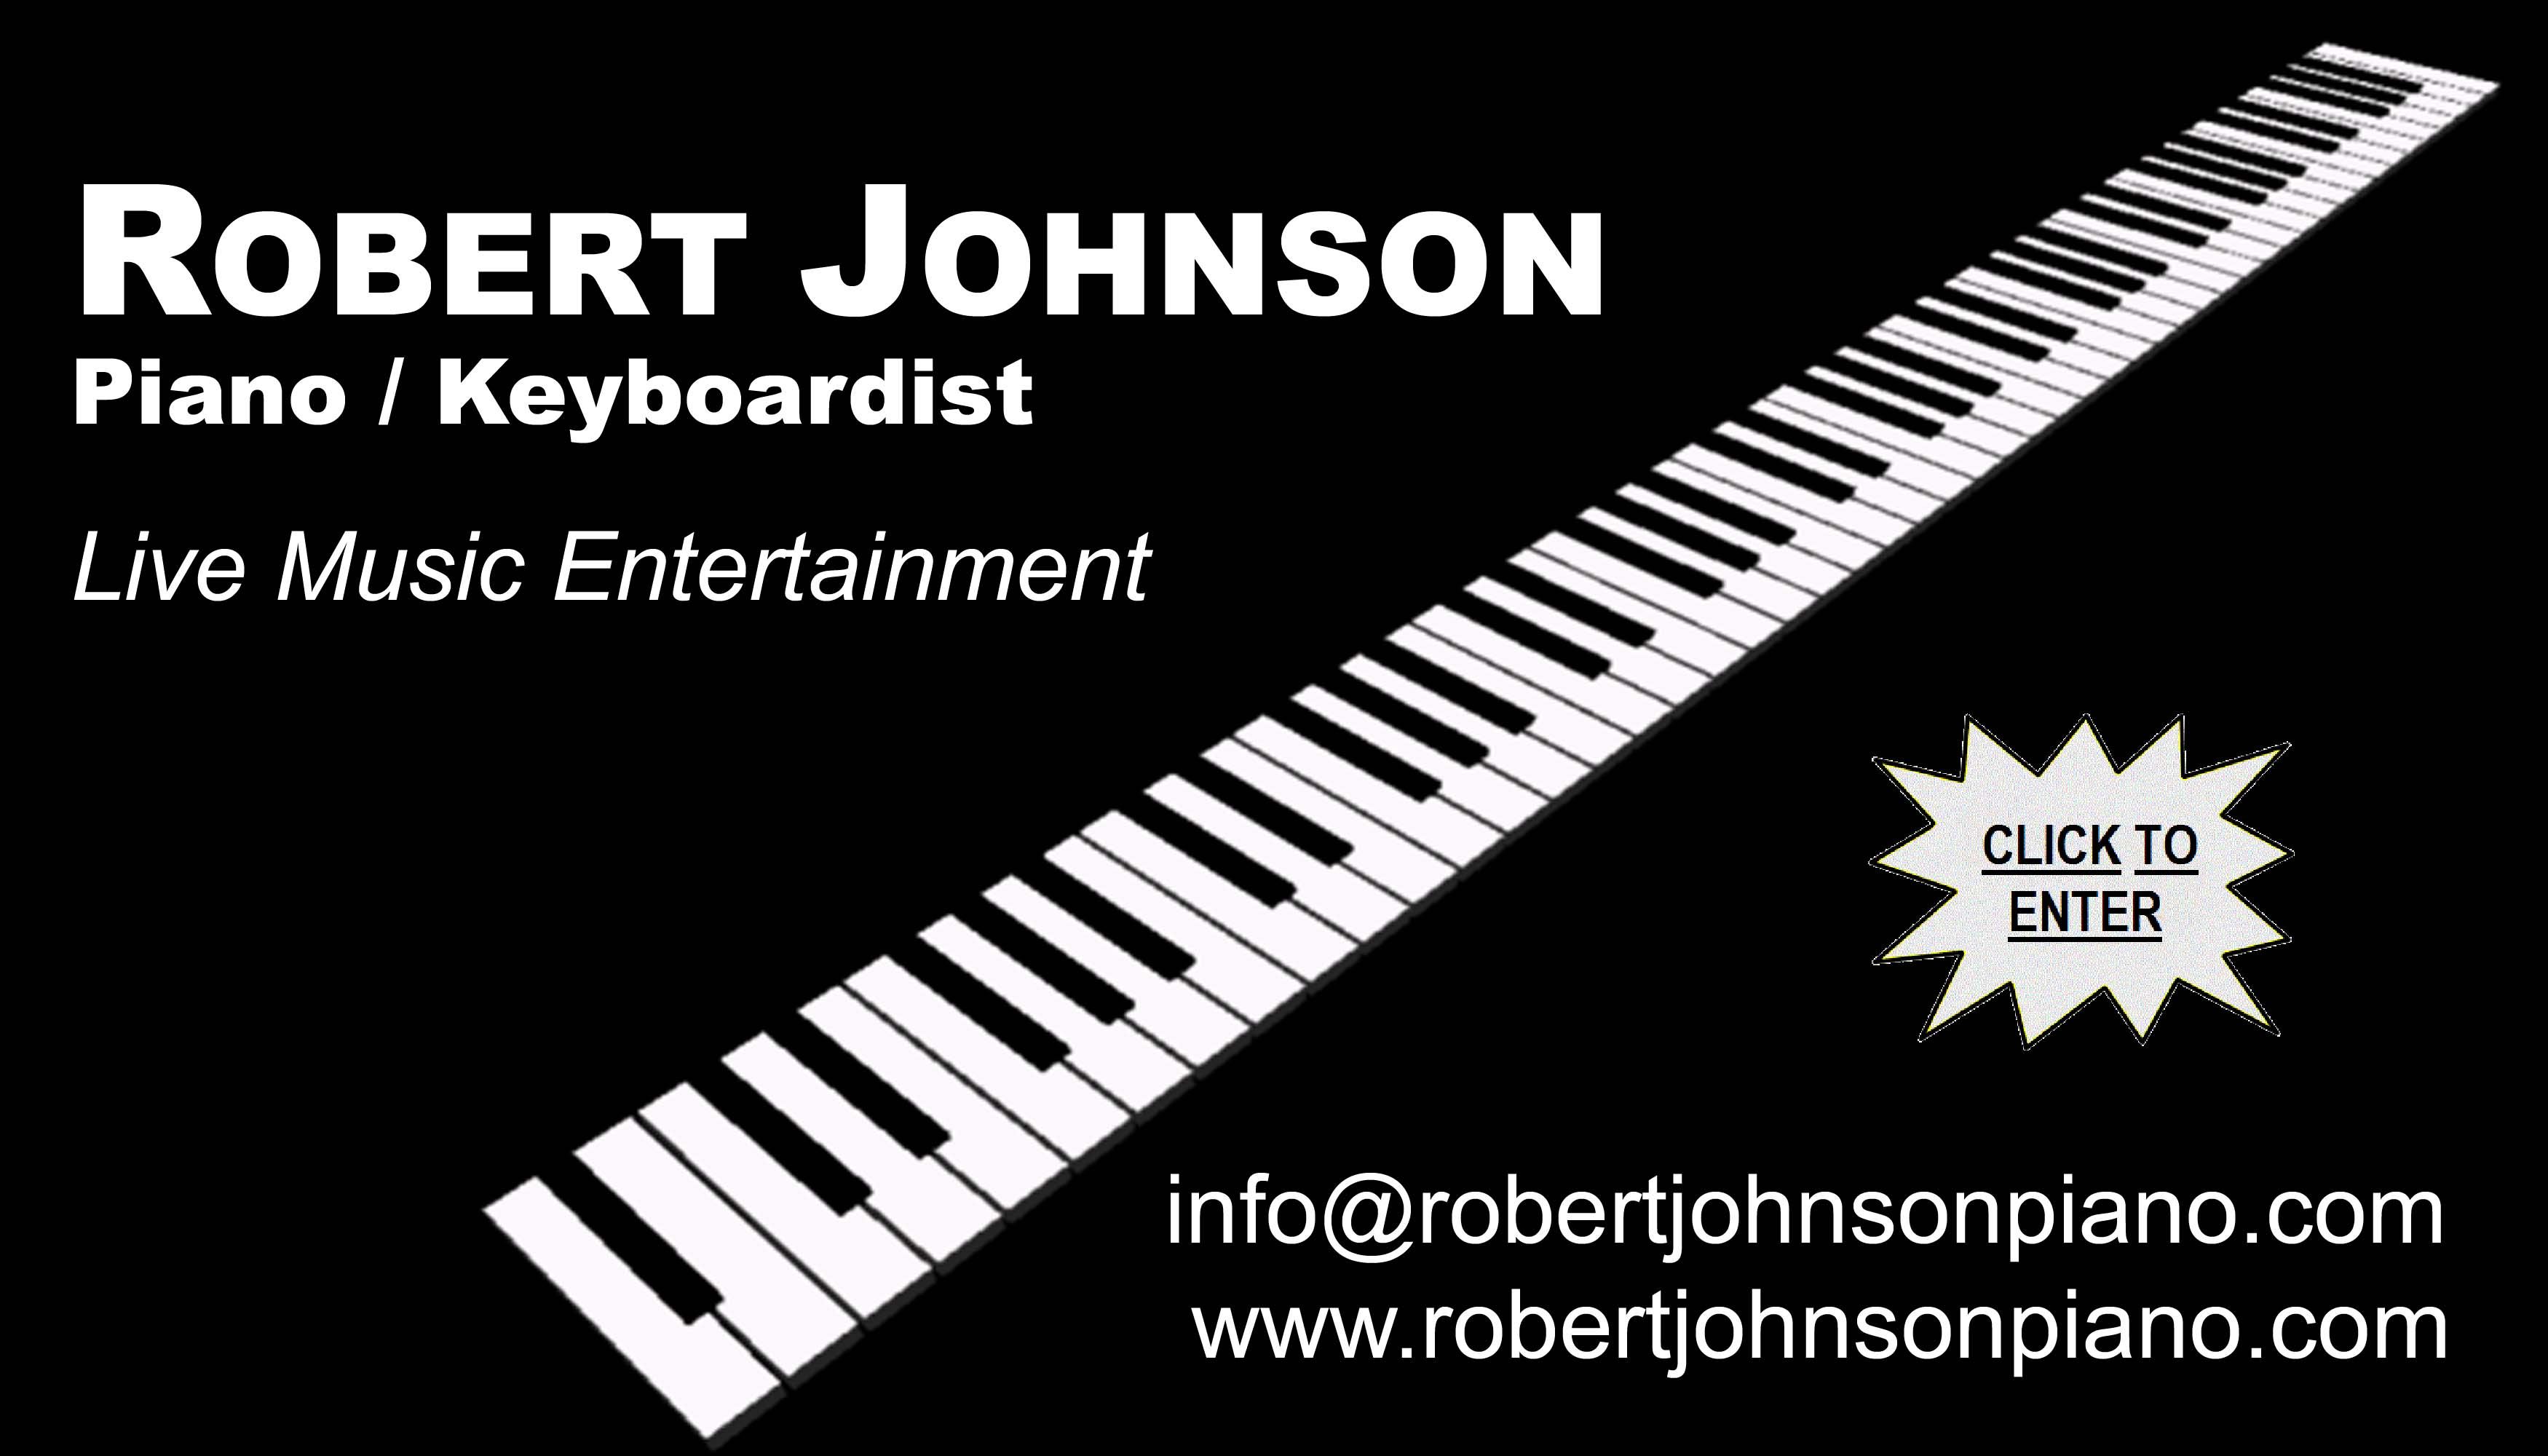 www.RobertJohnsonPiano.com